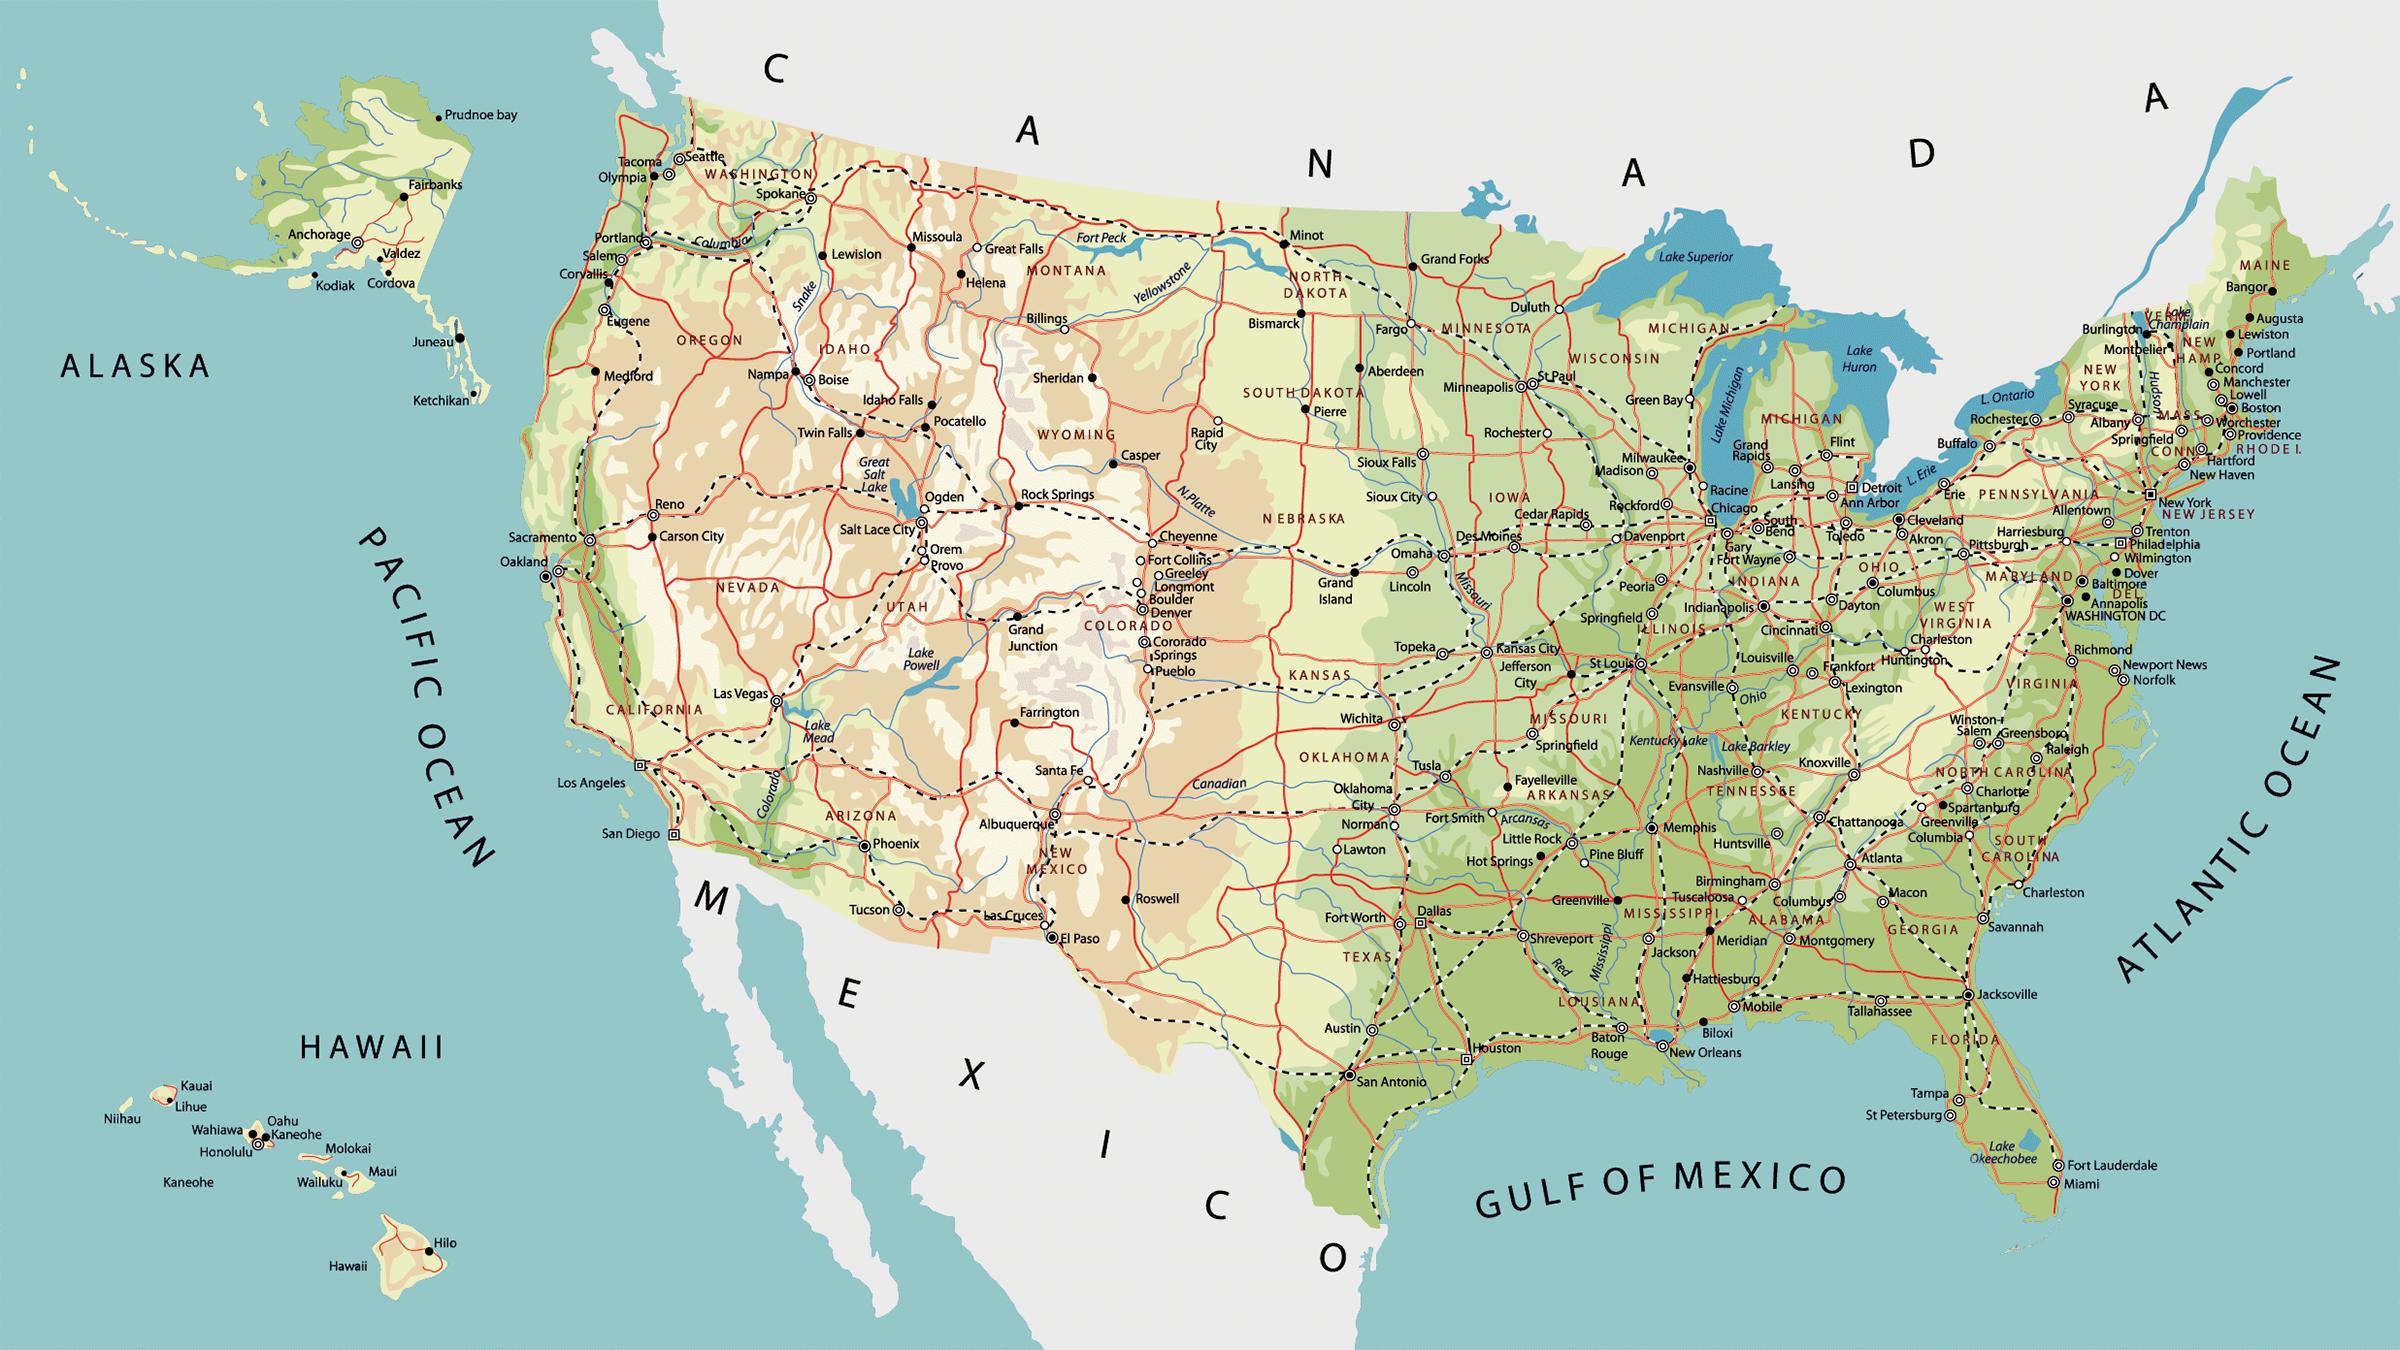 Mapa De Carreteras De Estados Unidos Mapas Del Mundo Pinterest - Mapa de united states